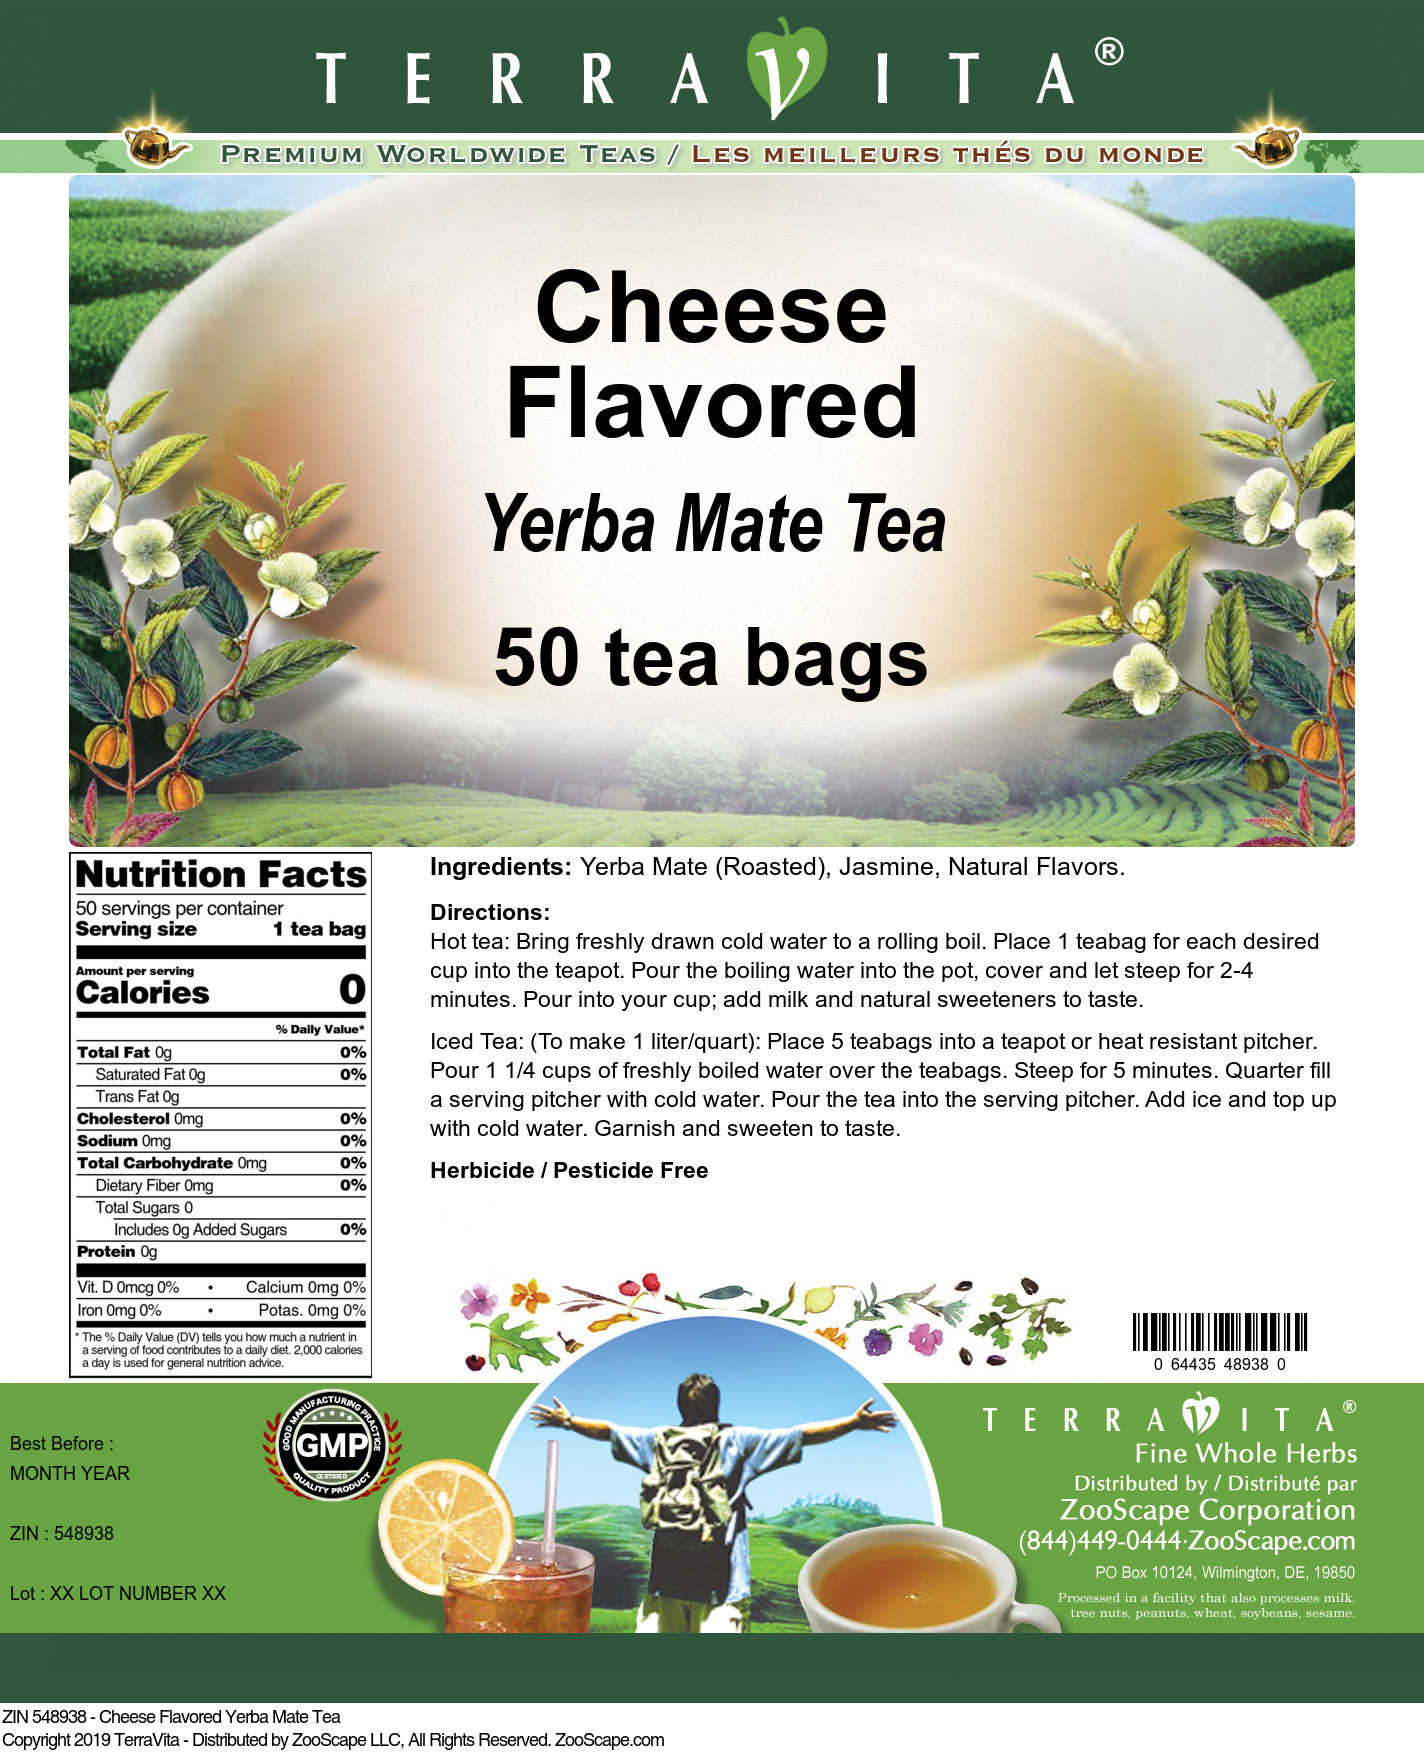 Cheese Flavored Yerba Mate Tea